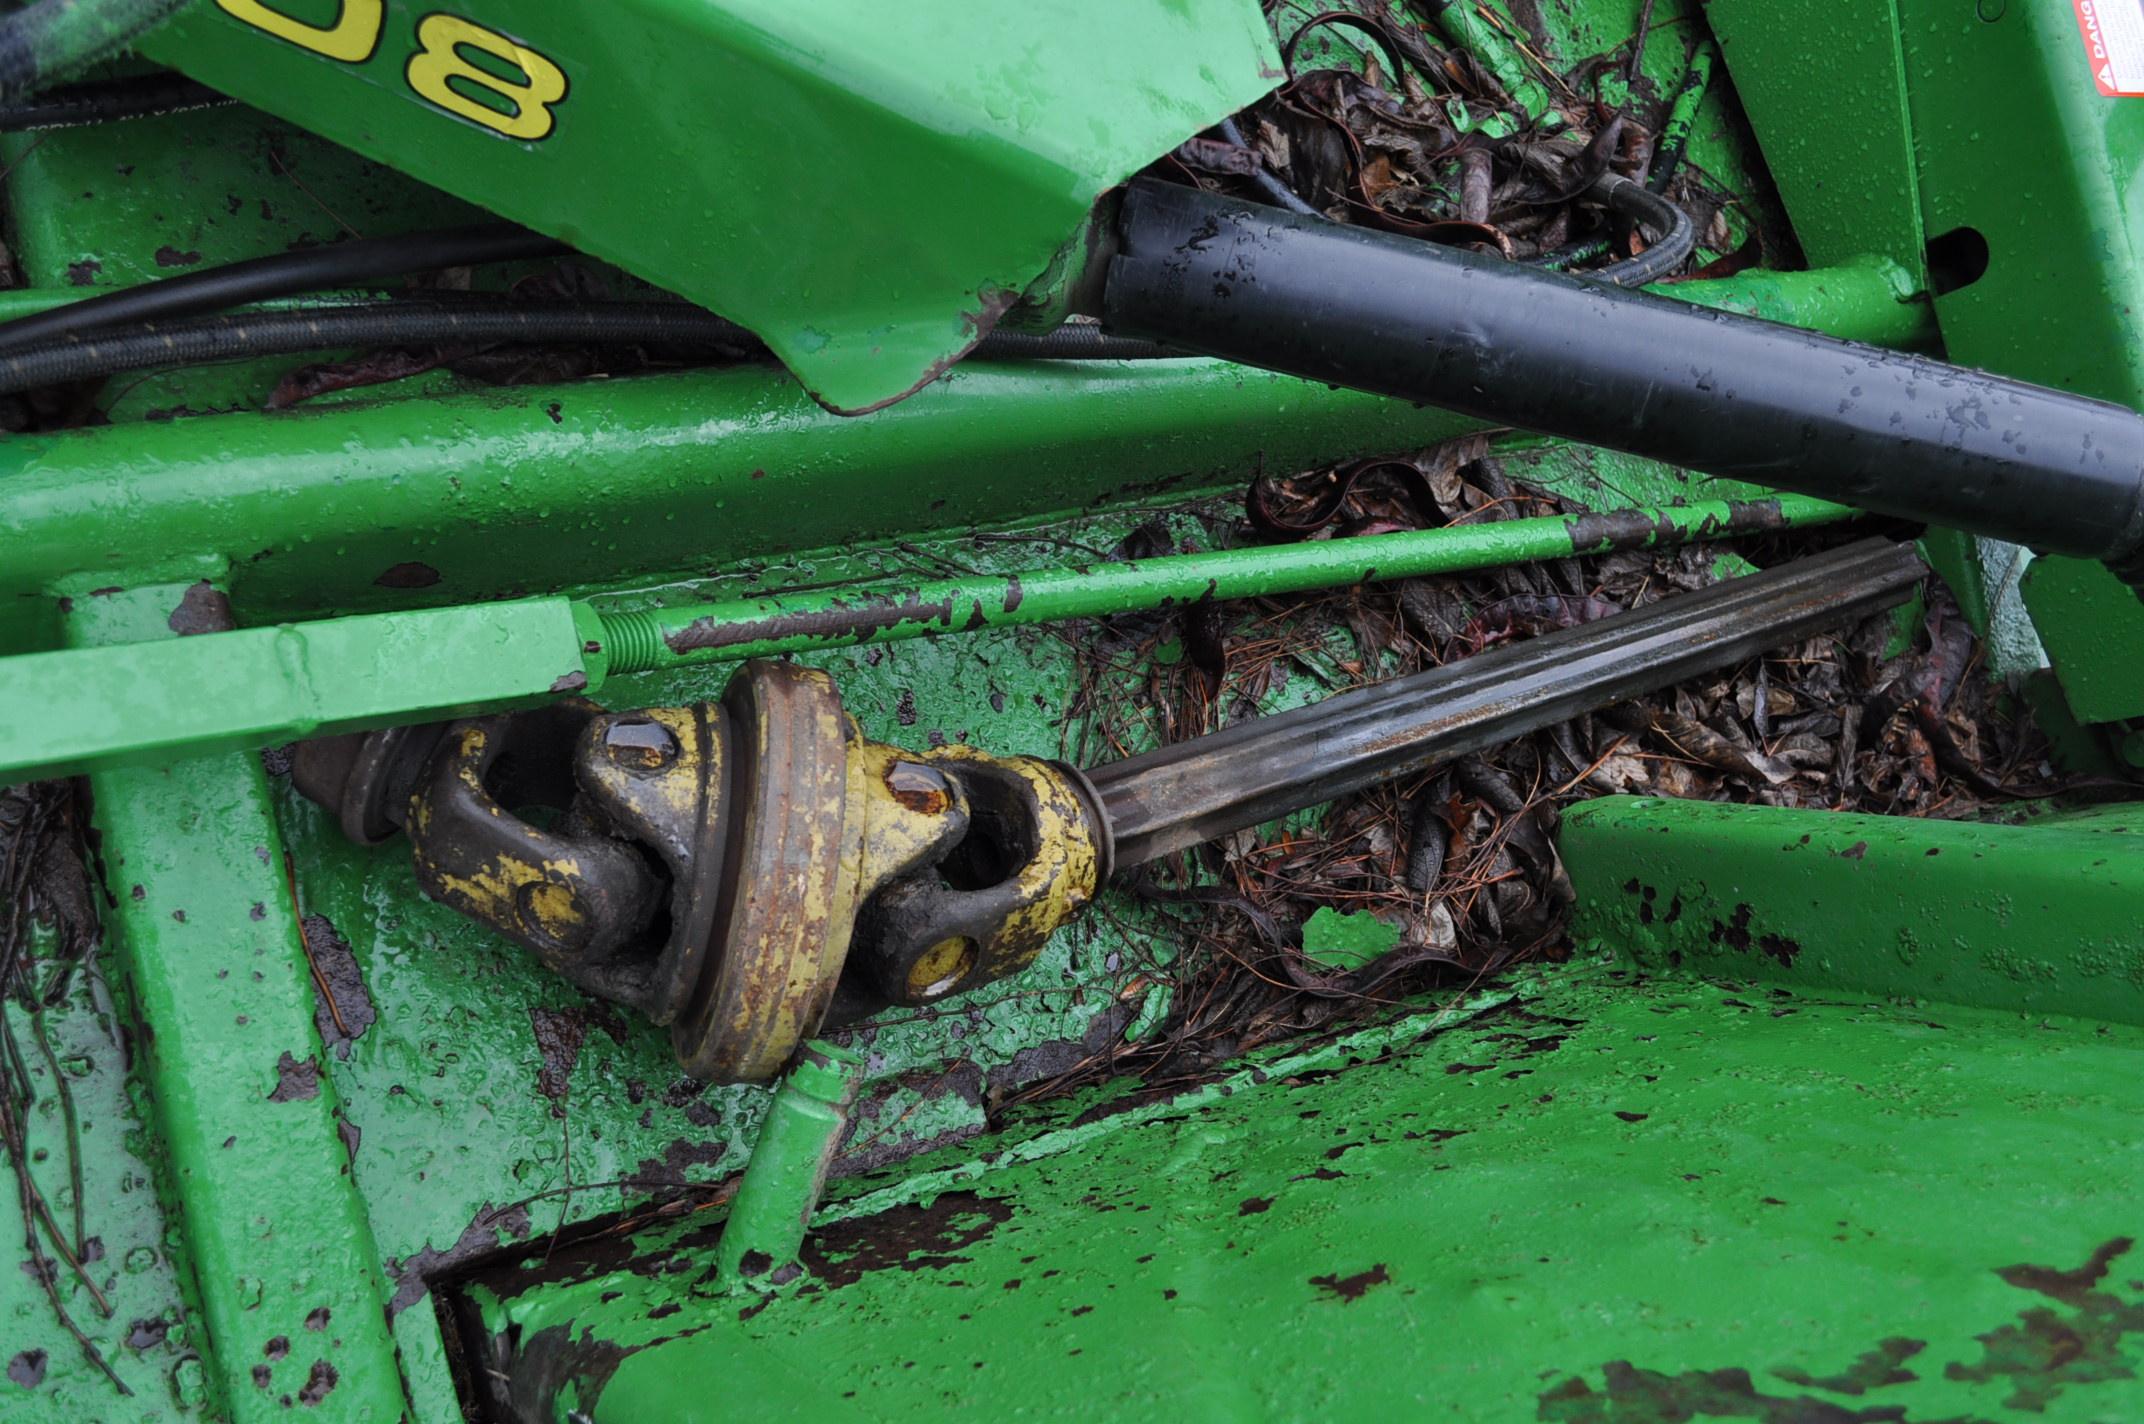 15' John Deere 1508 rotary mower, hyd fold, 1000 pto - Image 7 of 13